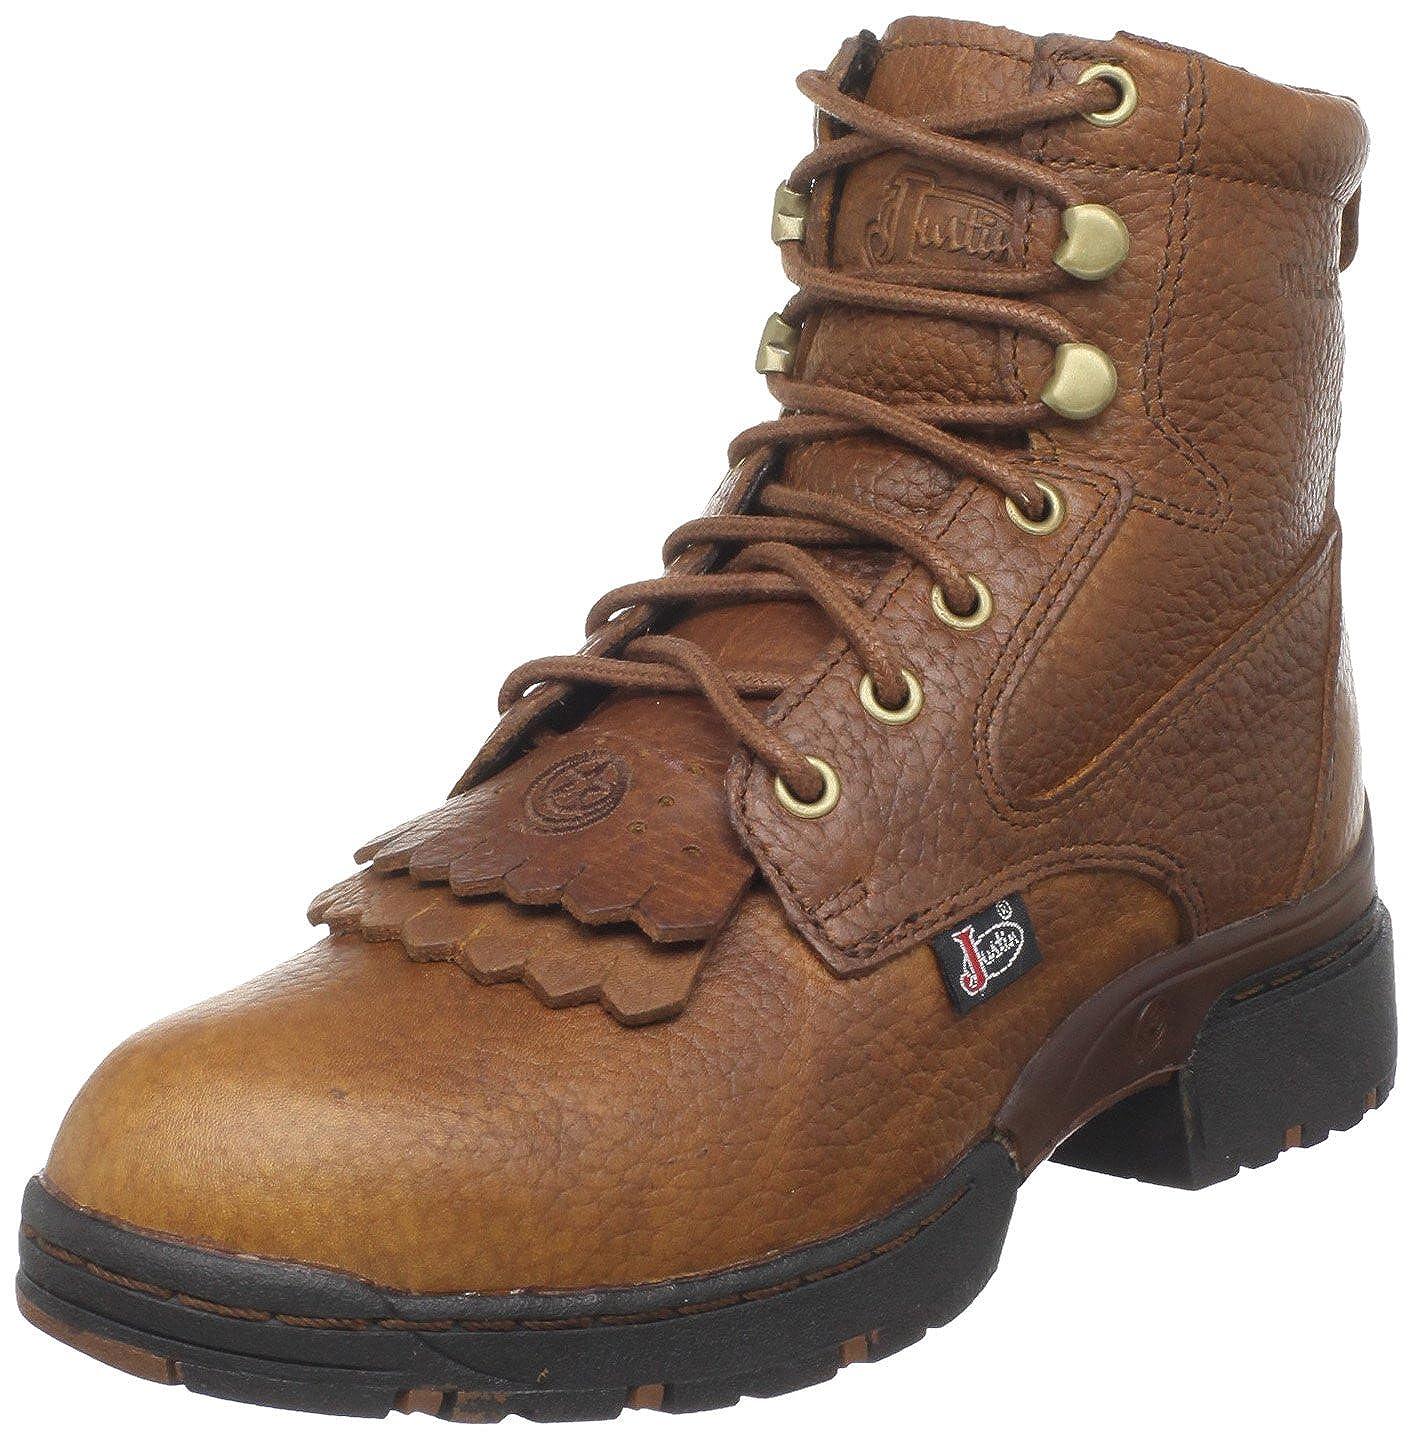 beb5975f0f0 Amazon.com | Justin Boots Women's George Strait 3.1-l0919-w | Ankle ...